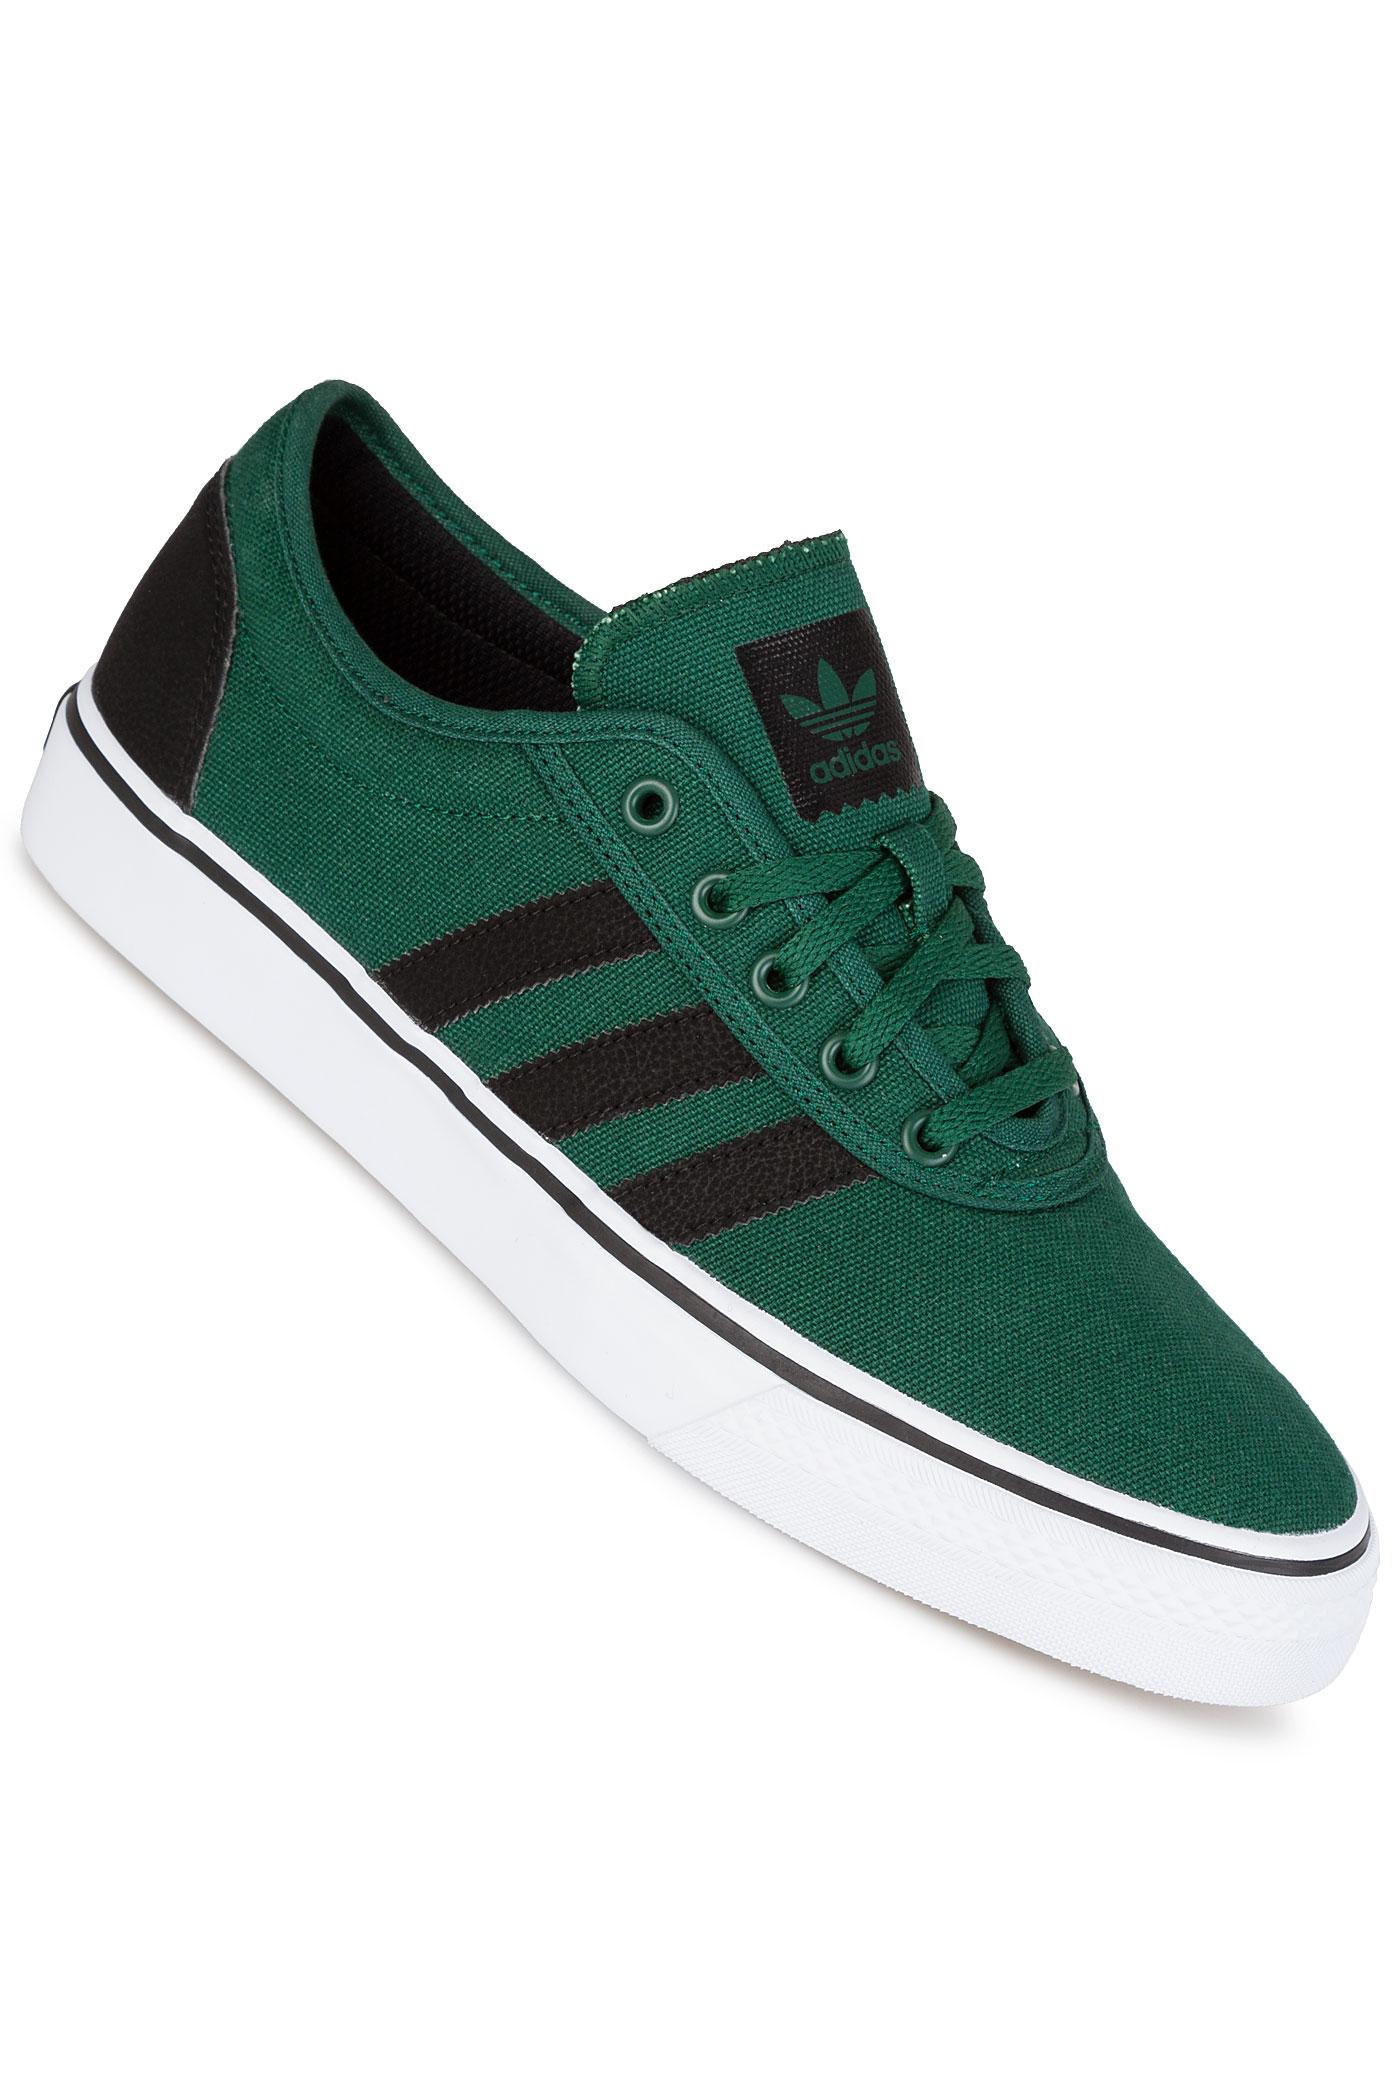 super popular 82f3b 40e3c adidas Adi Ease Schuh (collegiate green core black whit)